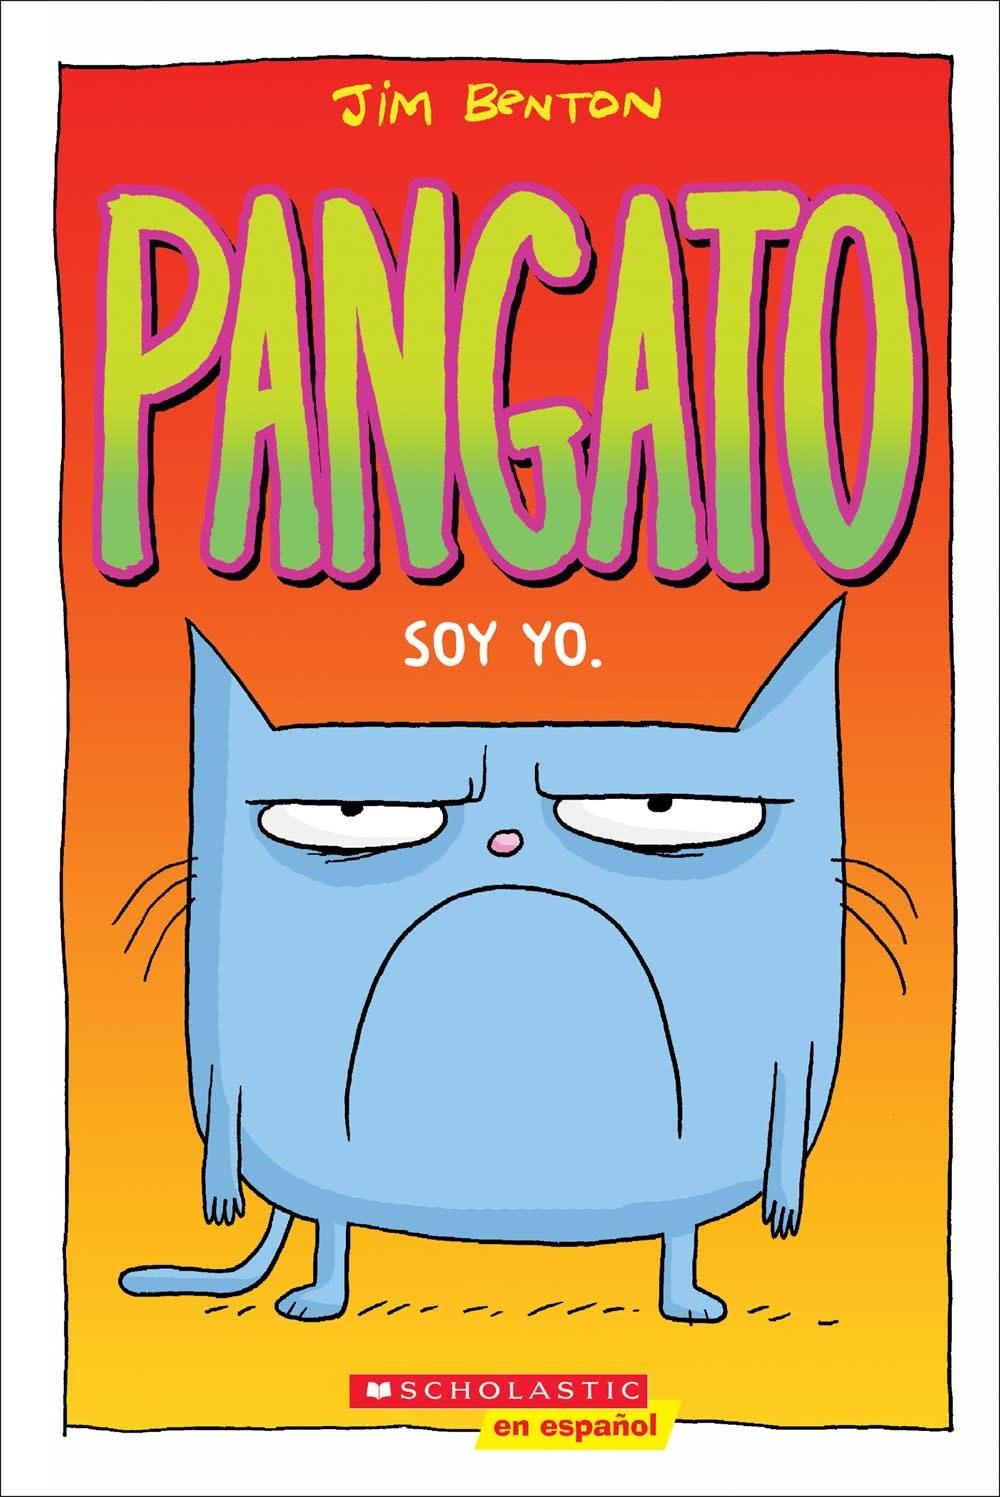 Scholastic en Espanol Catwad 01 It's Me. / Pangato 01 Soy yo. (Spanish)